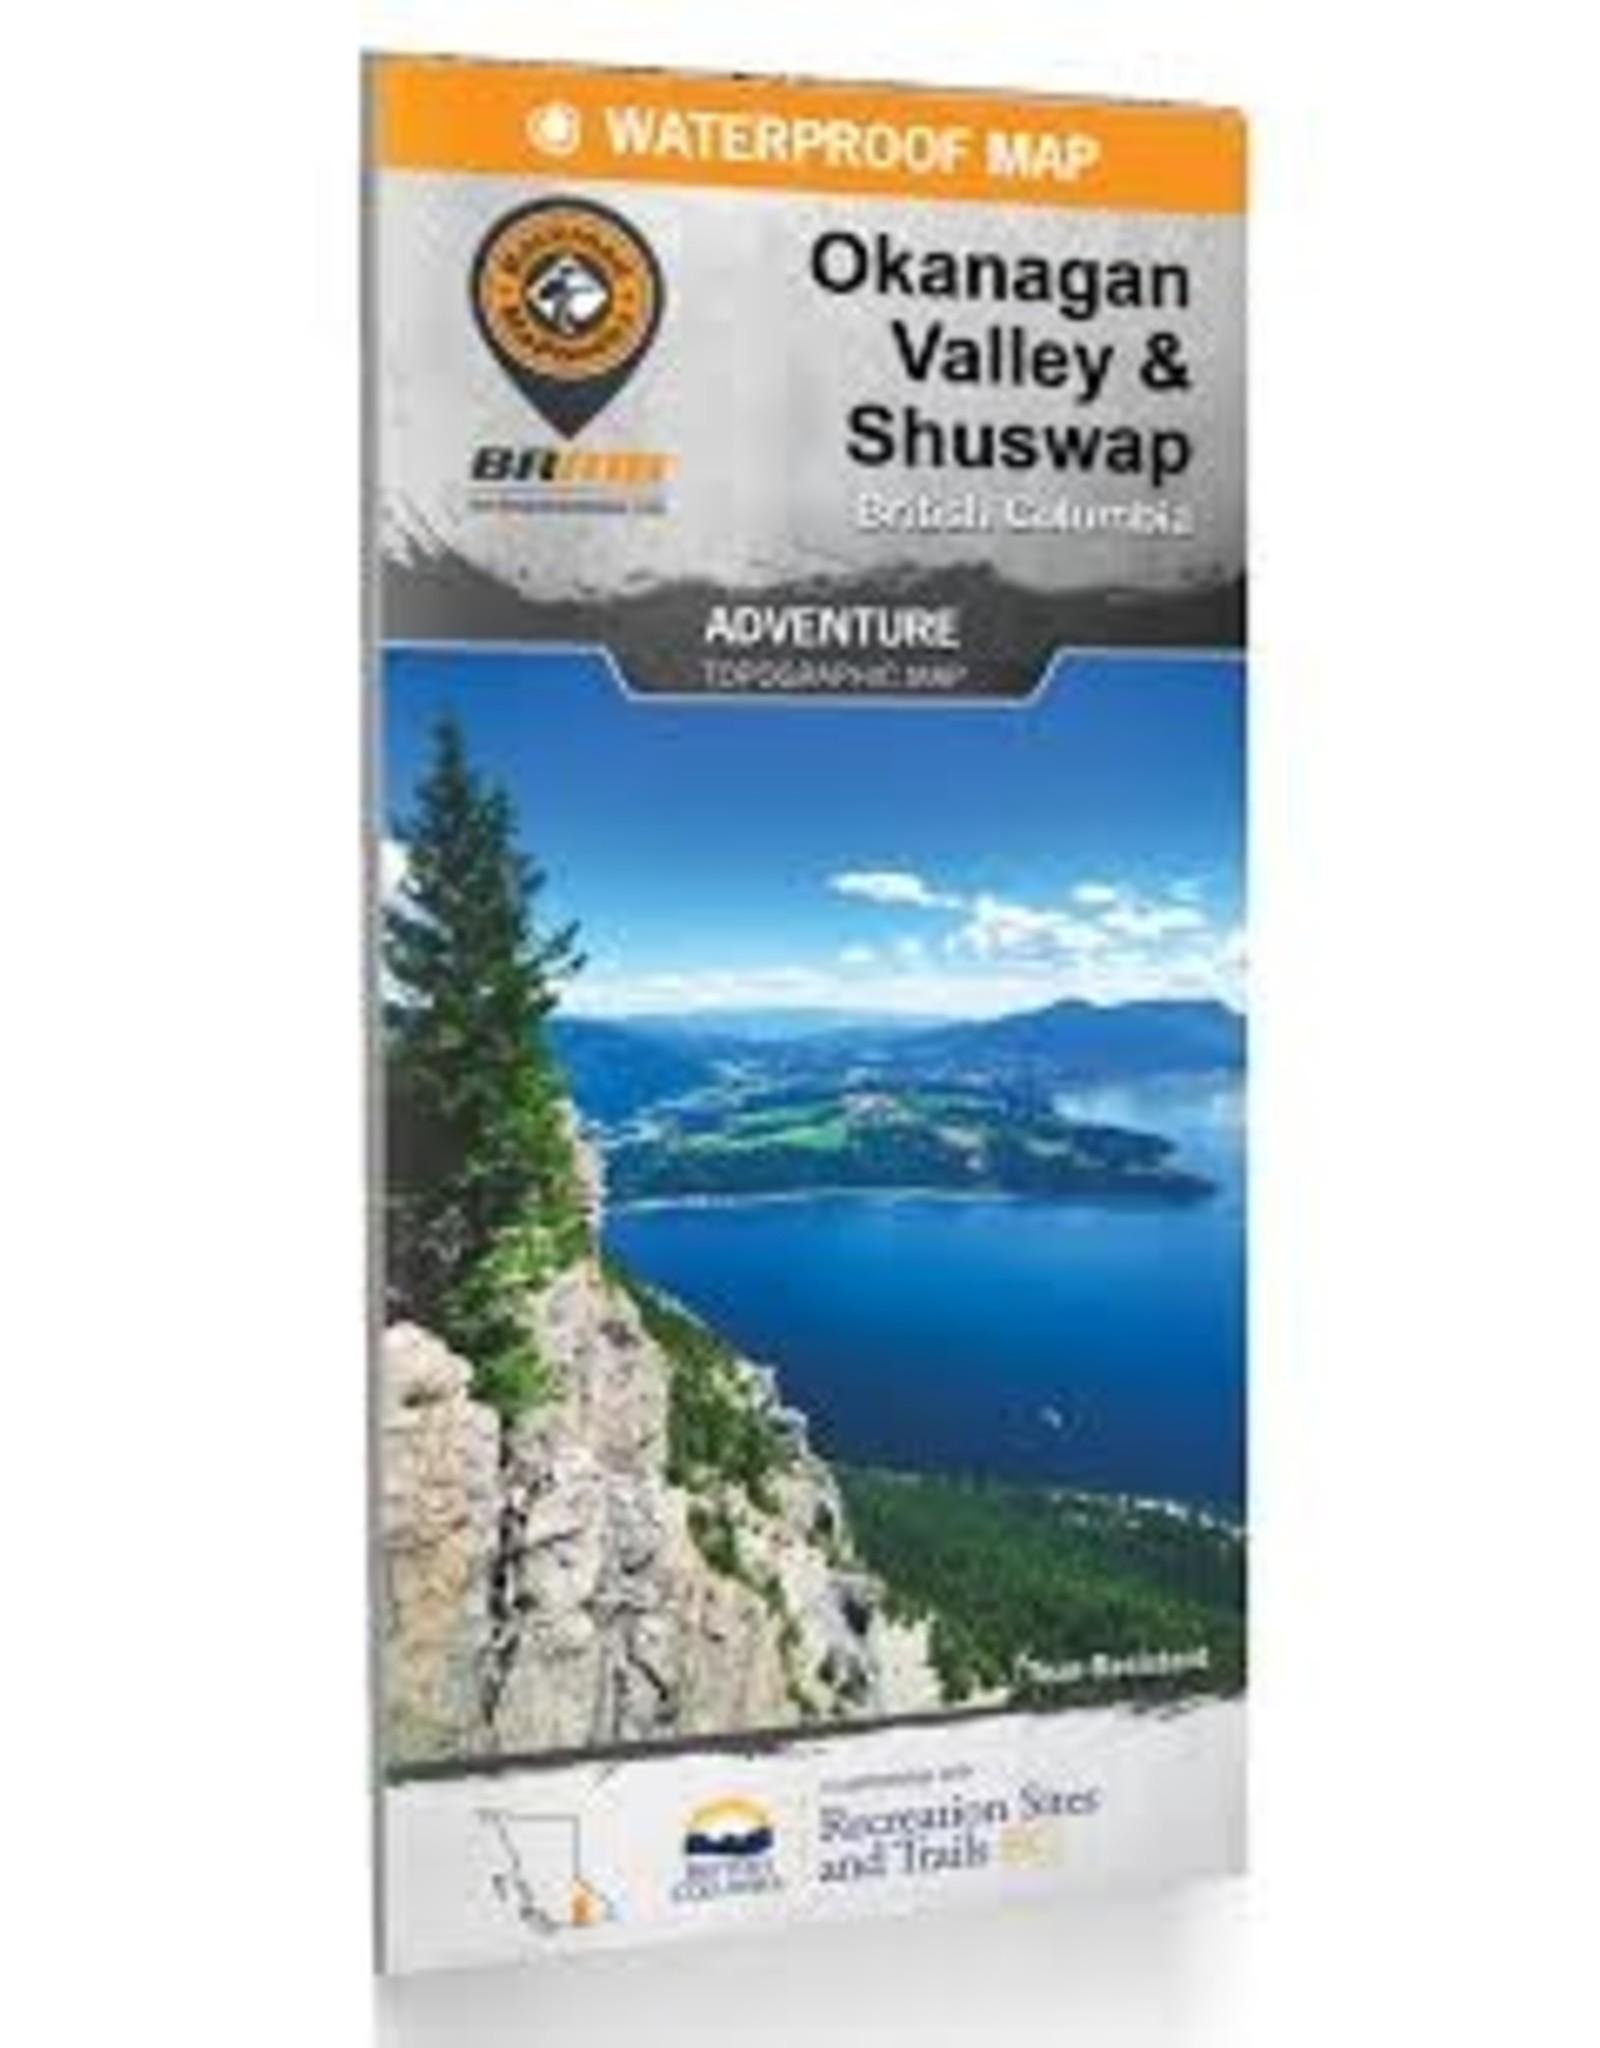 BRMB BRMB Okanagan Valley & Shuswap BC Waterproof Map